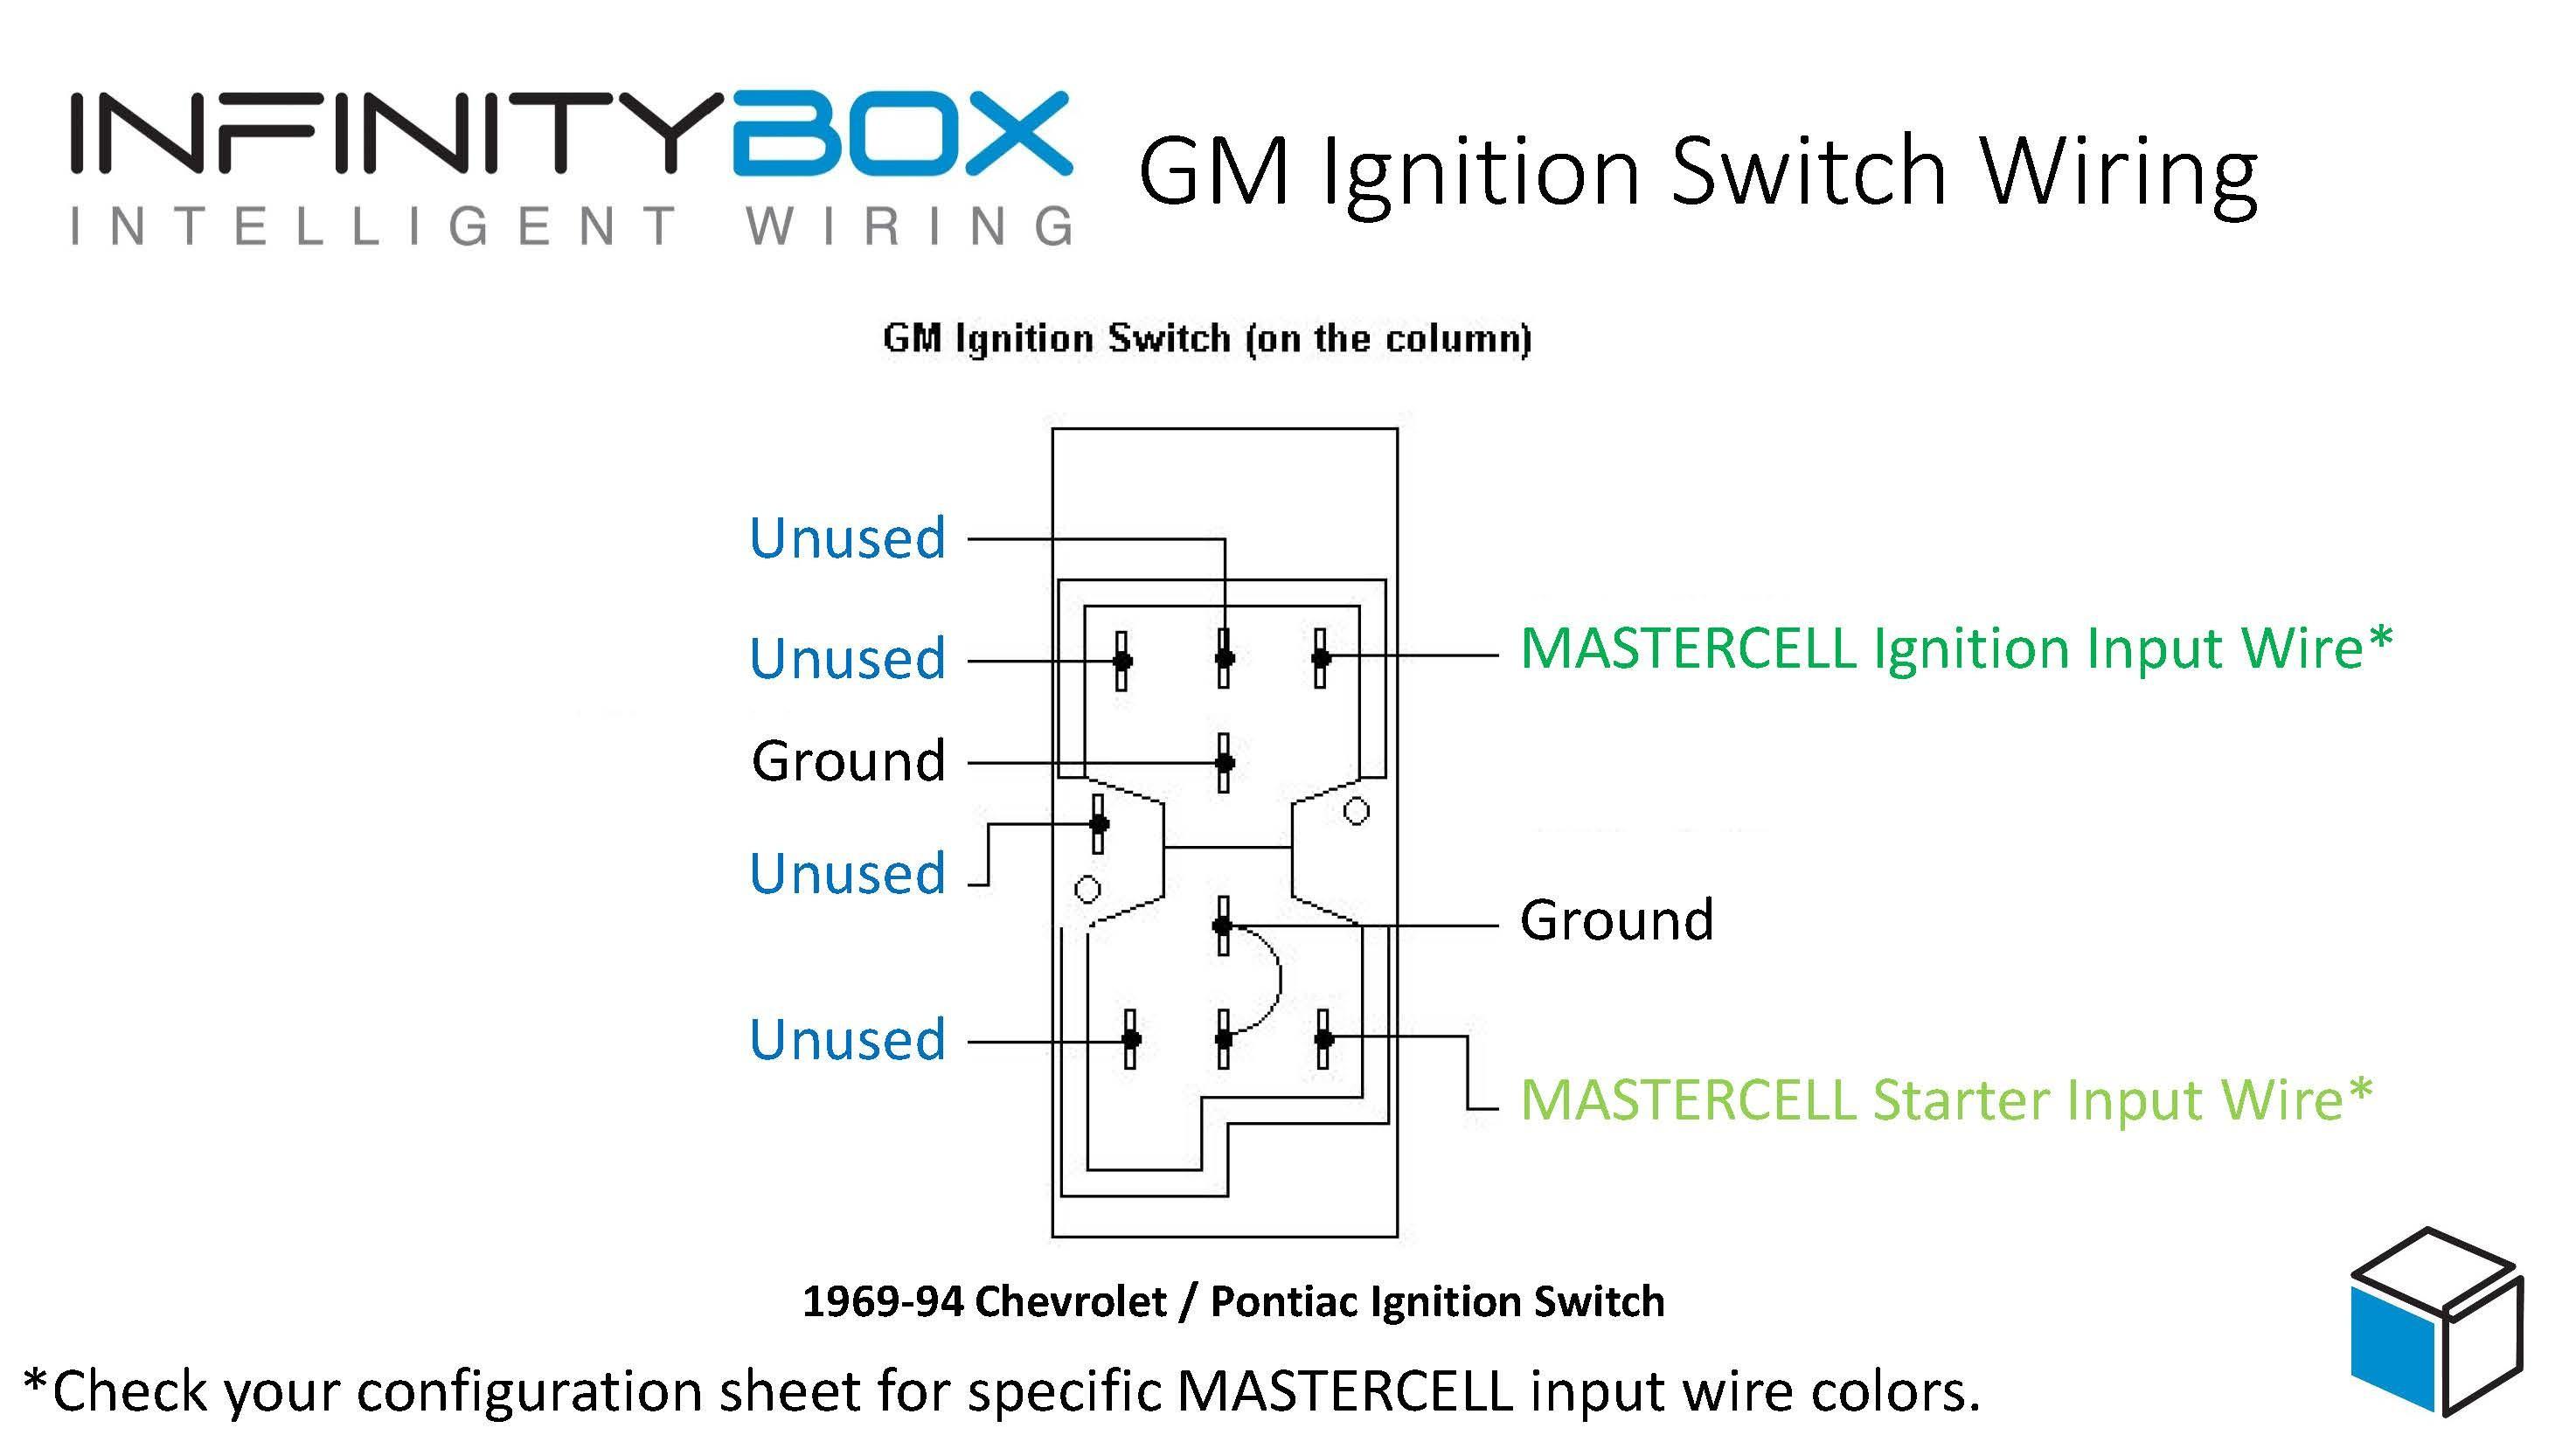 Automotive Switch Wiring Diagram Save Universal Ignition Switch Wiring Diagram Jerrysmasterkeyforyouand